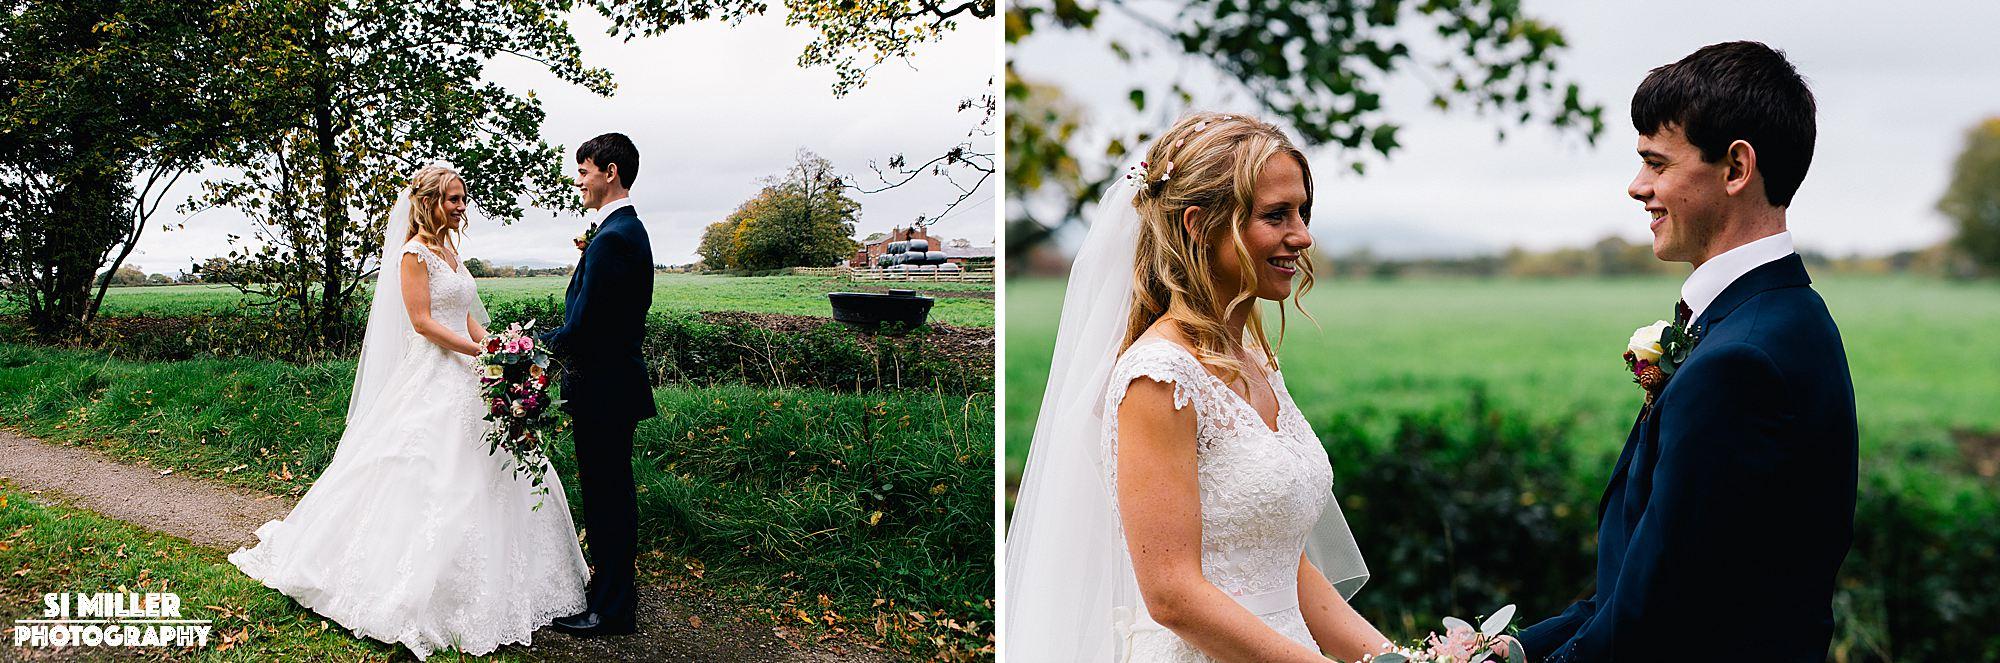 Newly weds portraits on farm preston